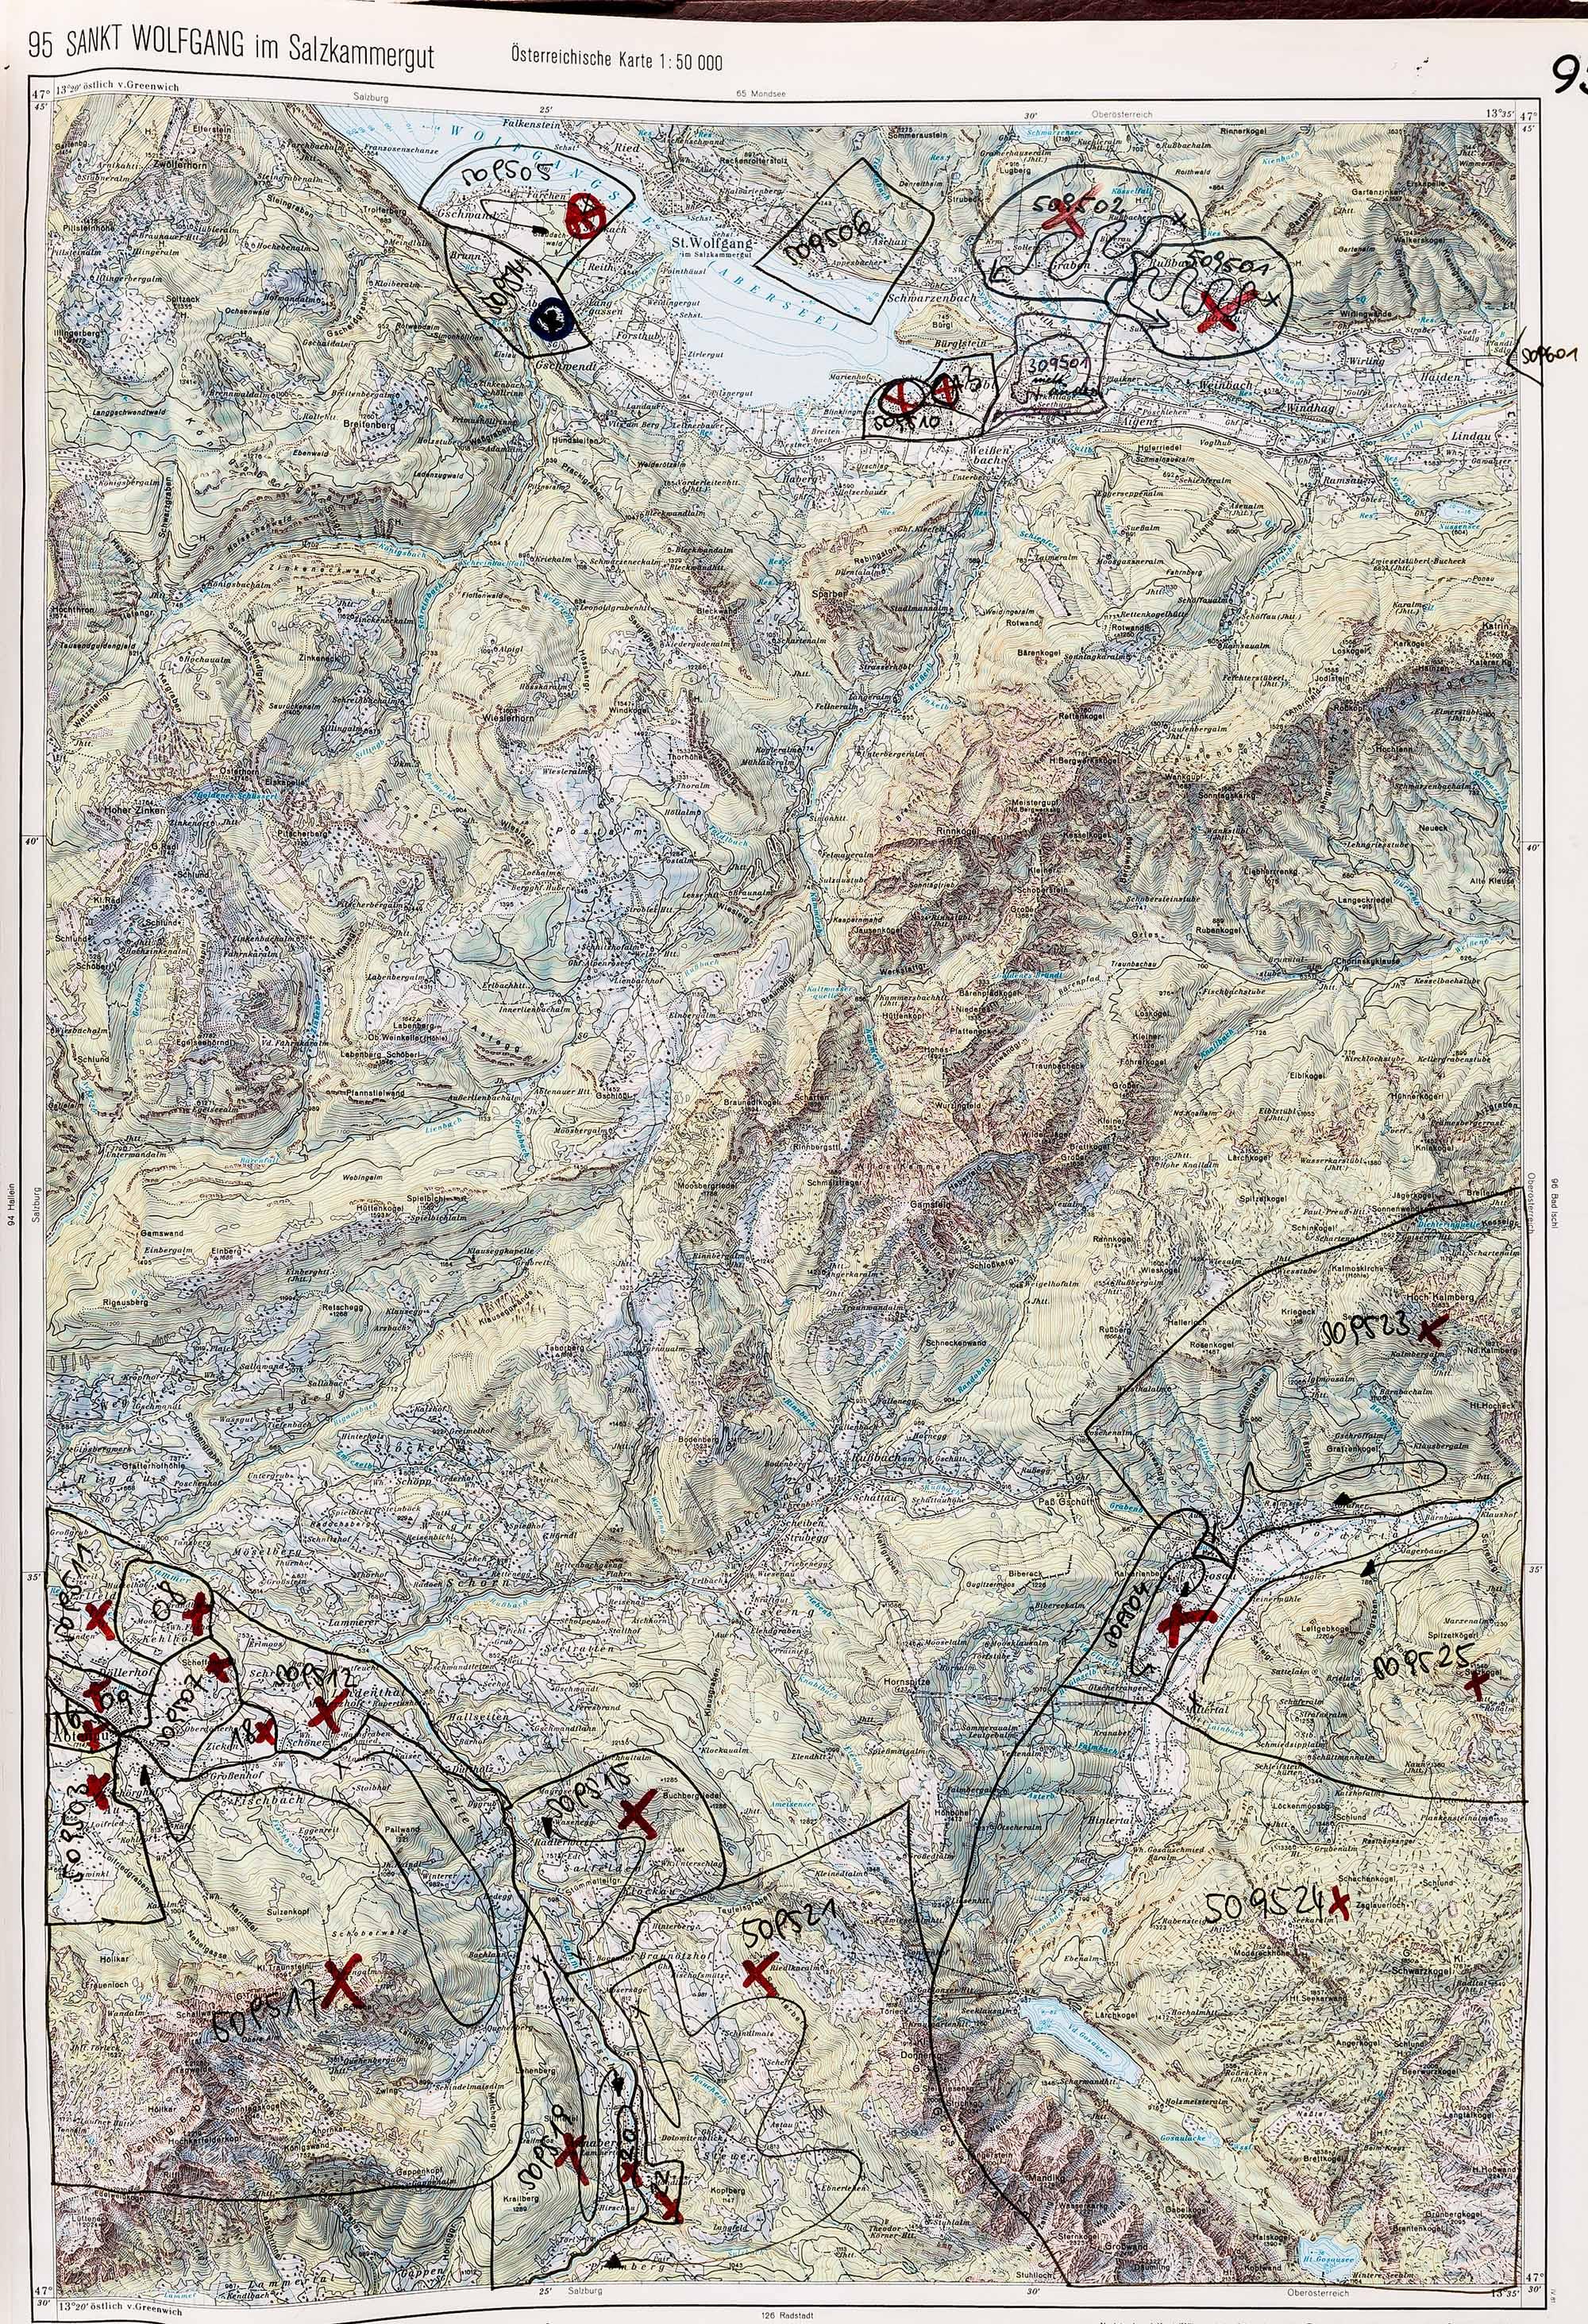 1983-1986 Karte 095